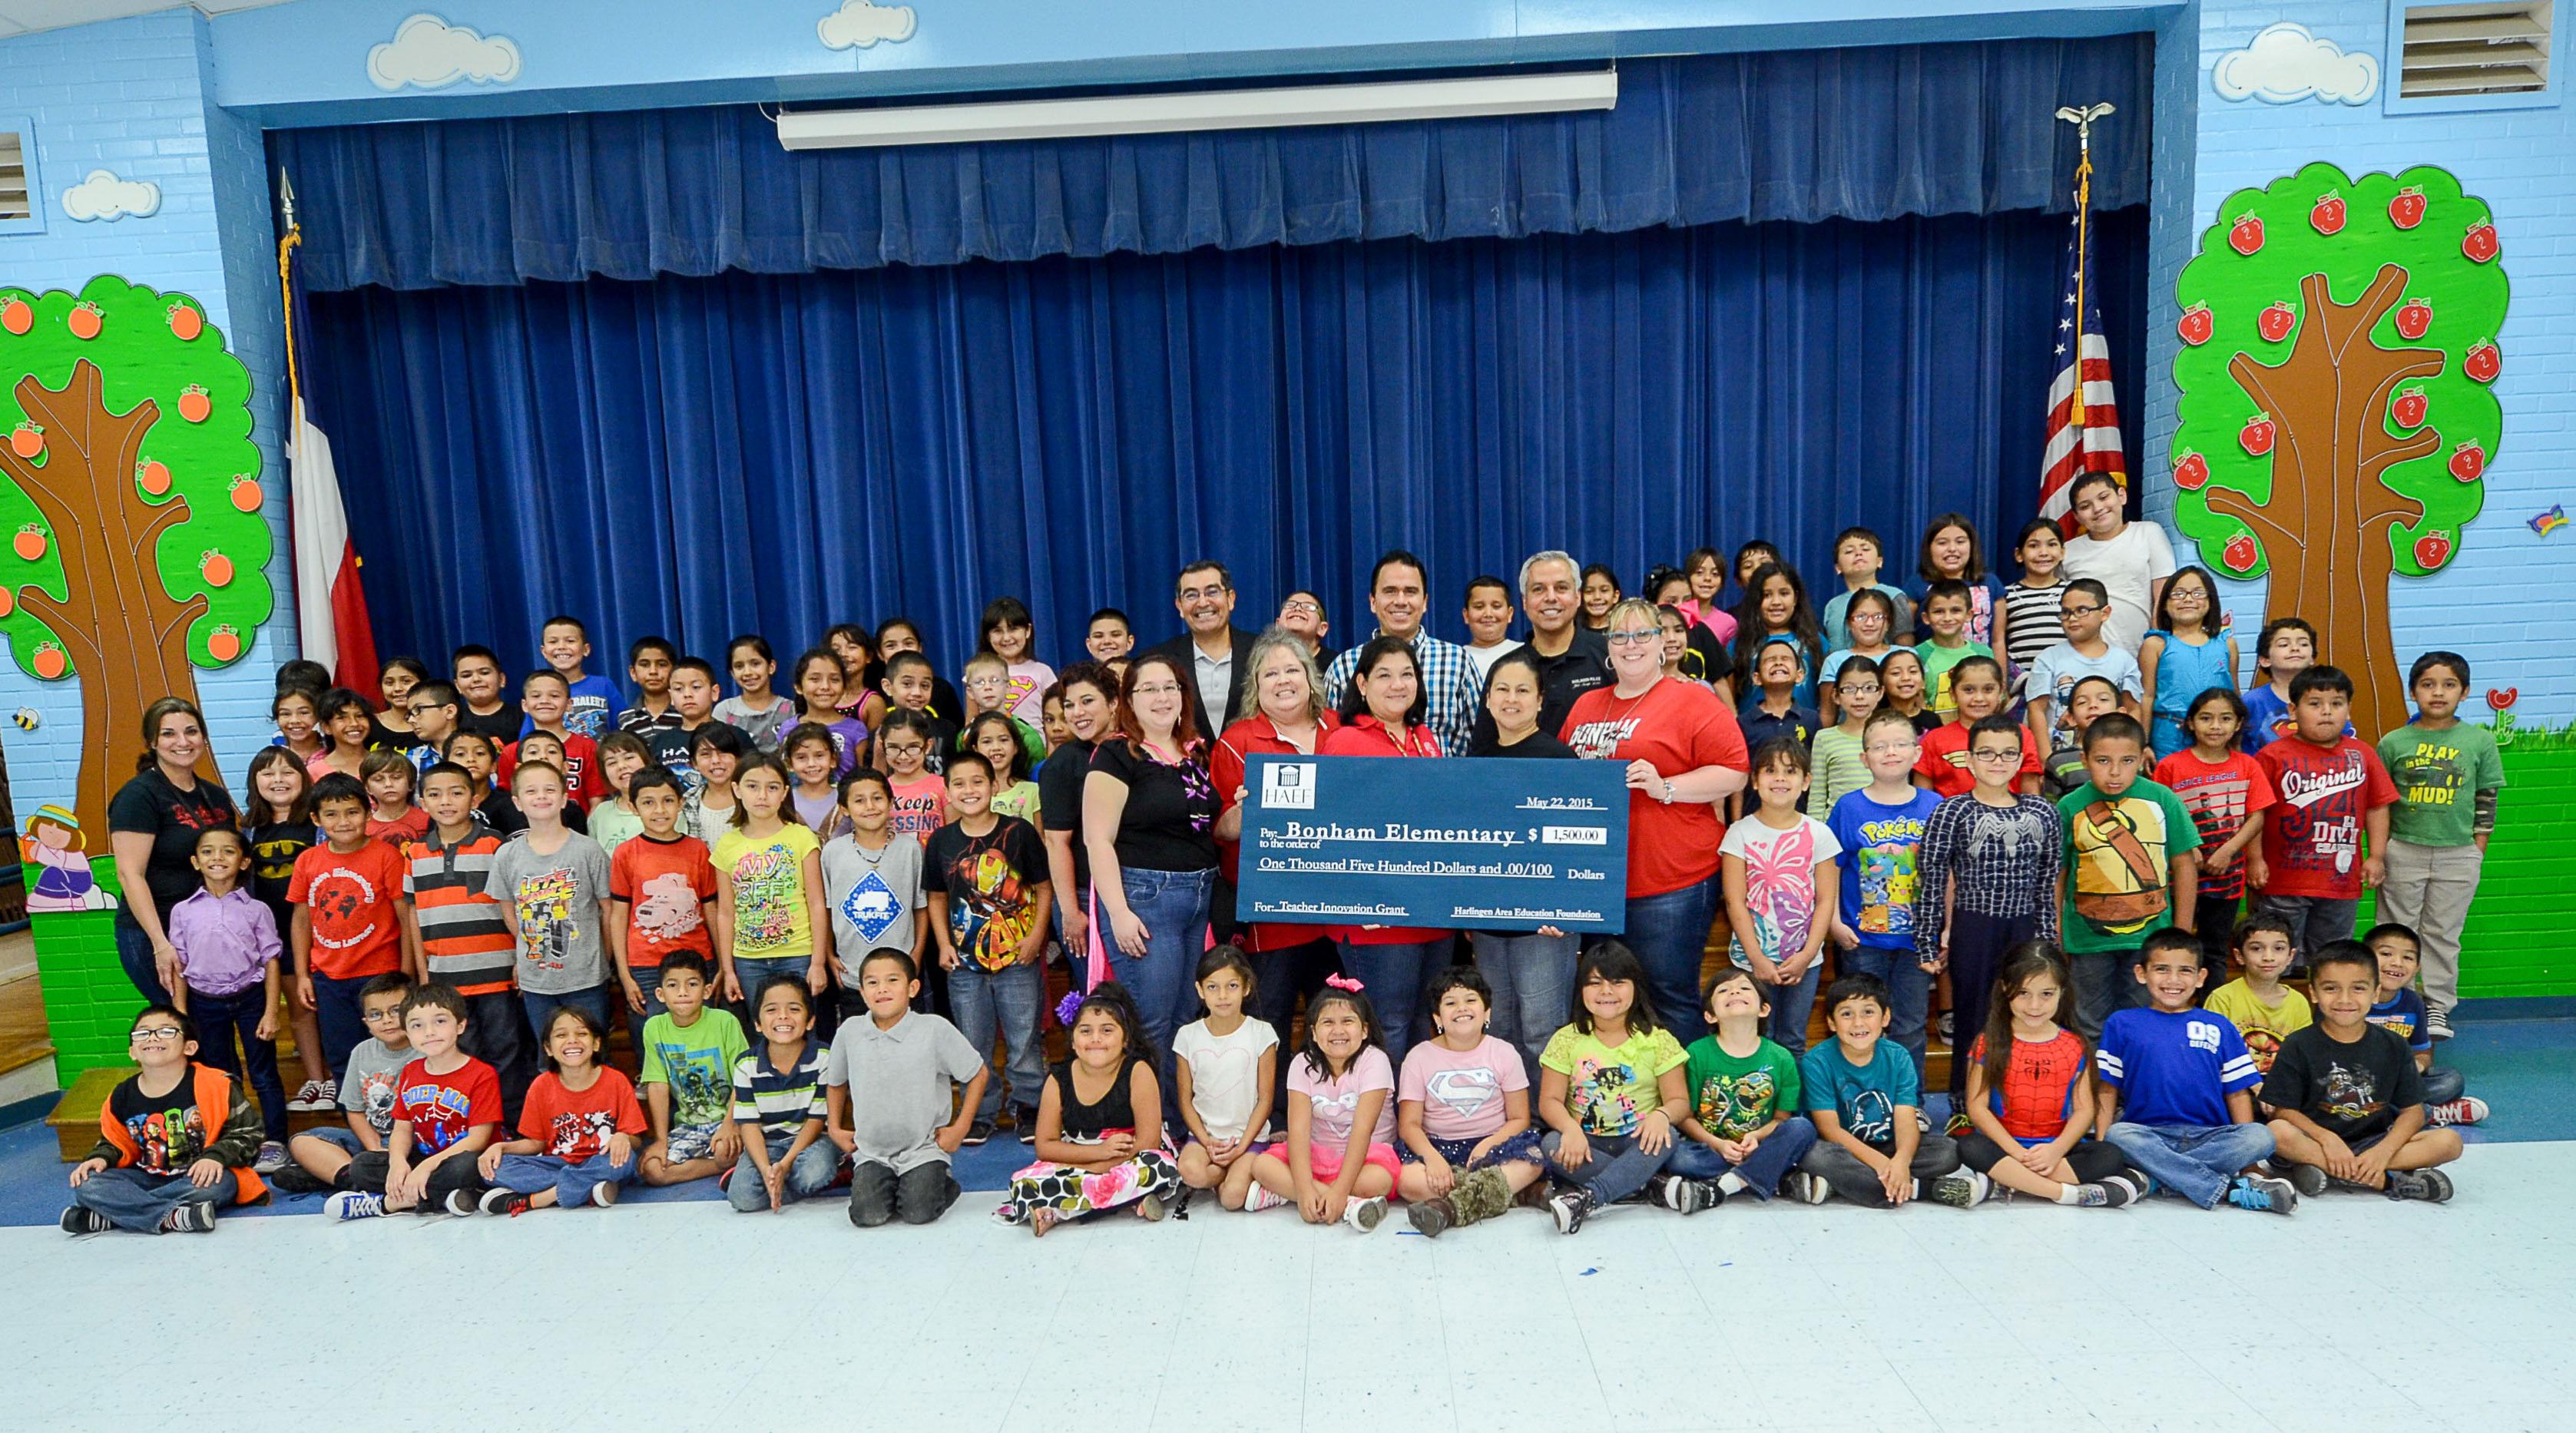 Bonham Second Grade team awarded Innovative Teaching Grant